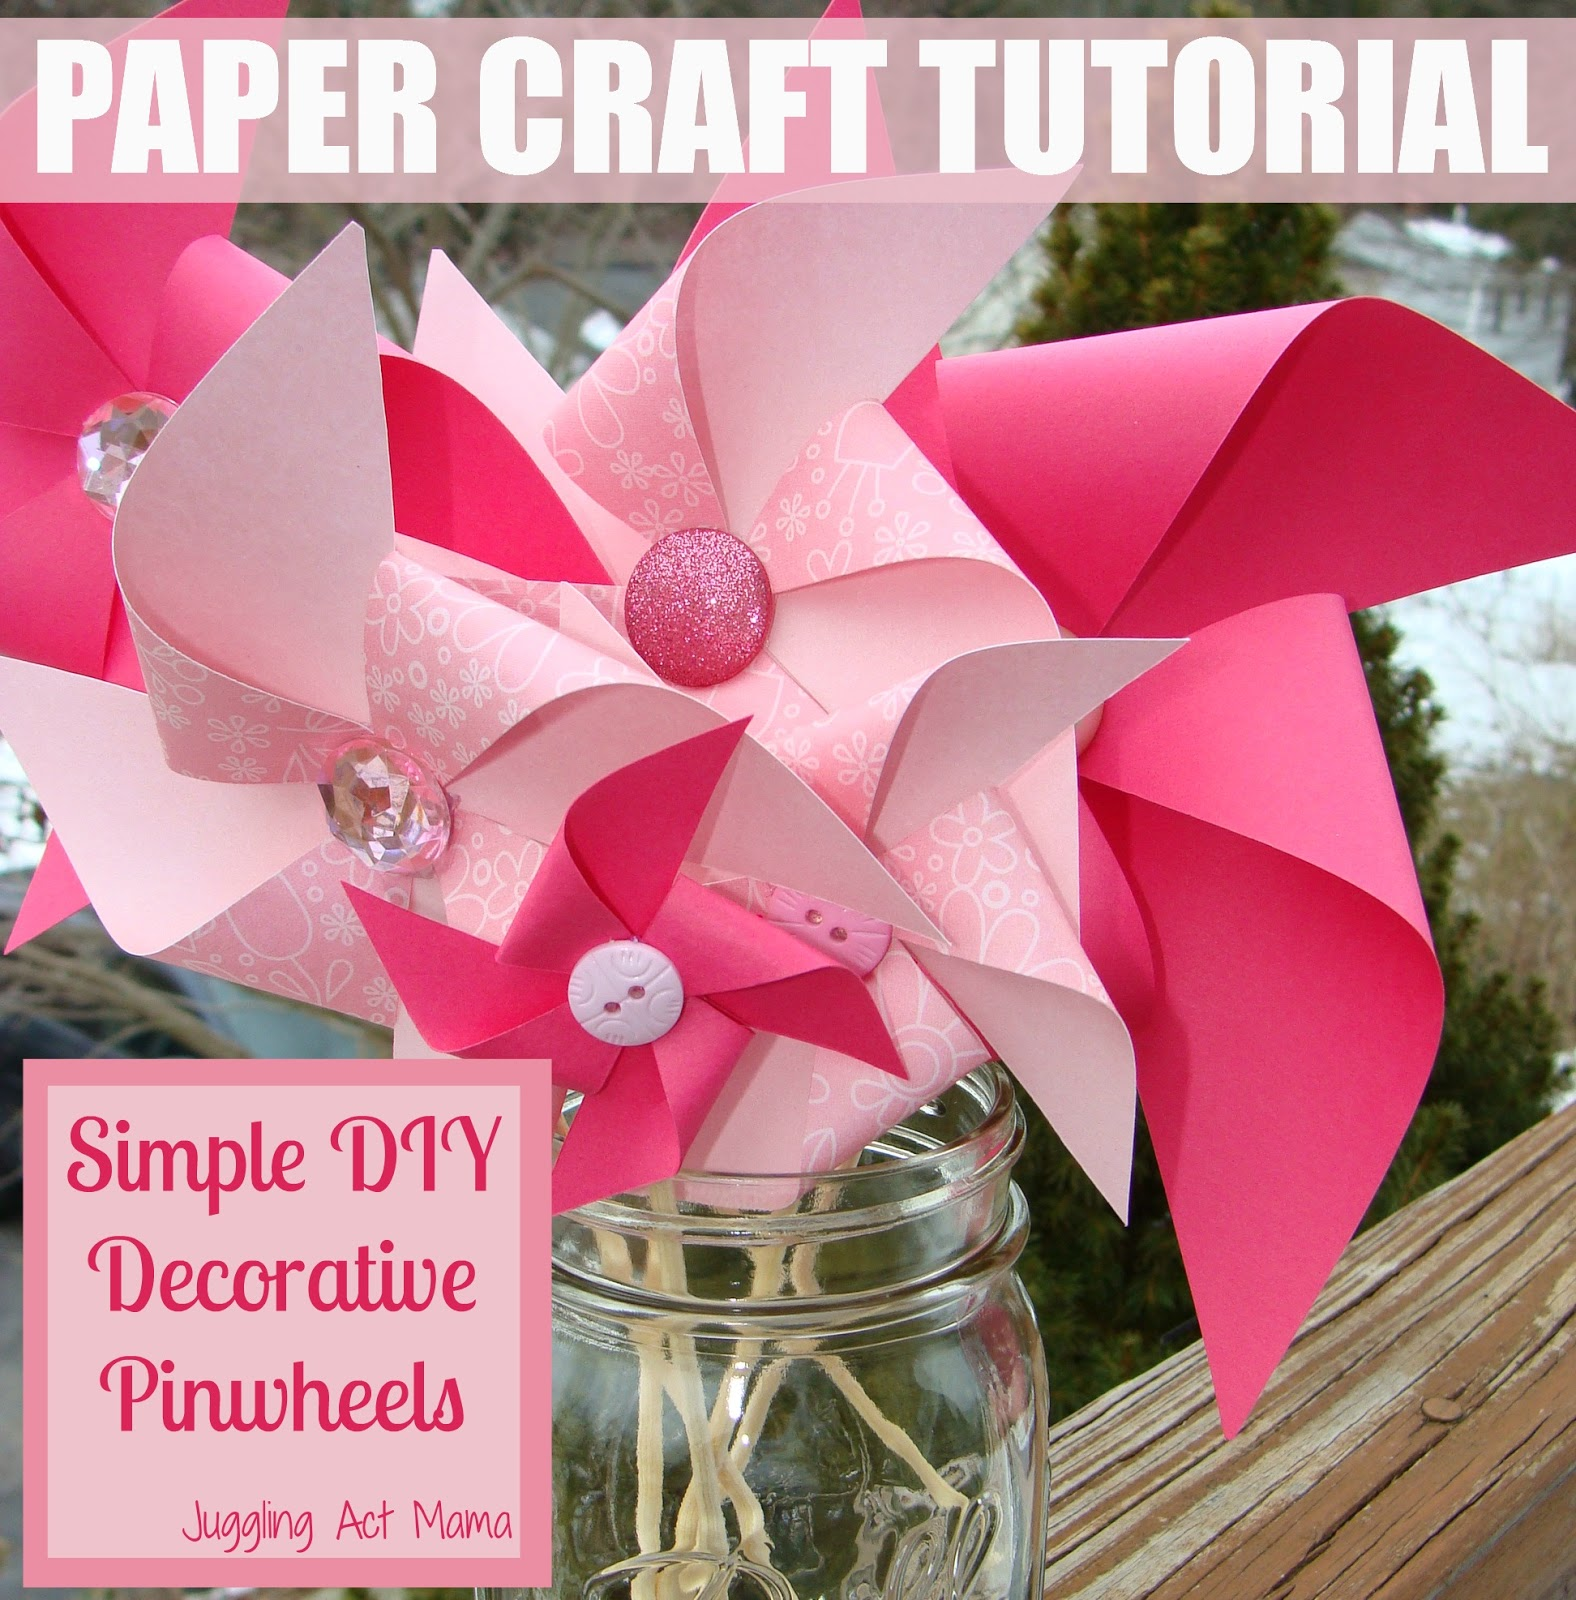 TUTORIAL - Simple DIY Decorative Pinwheels - Juggling Act Mama